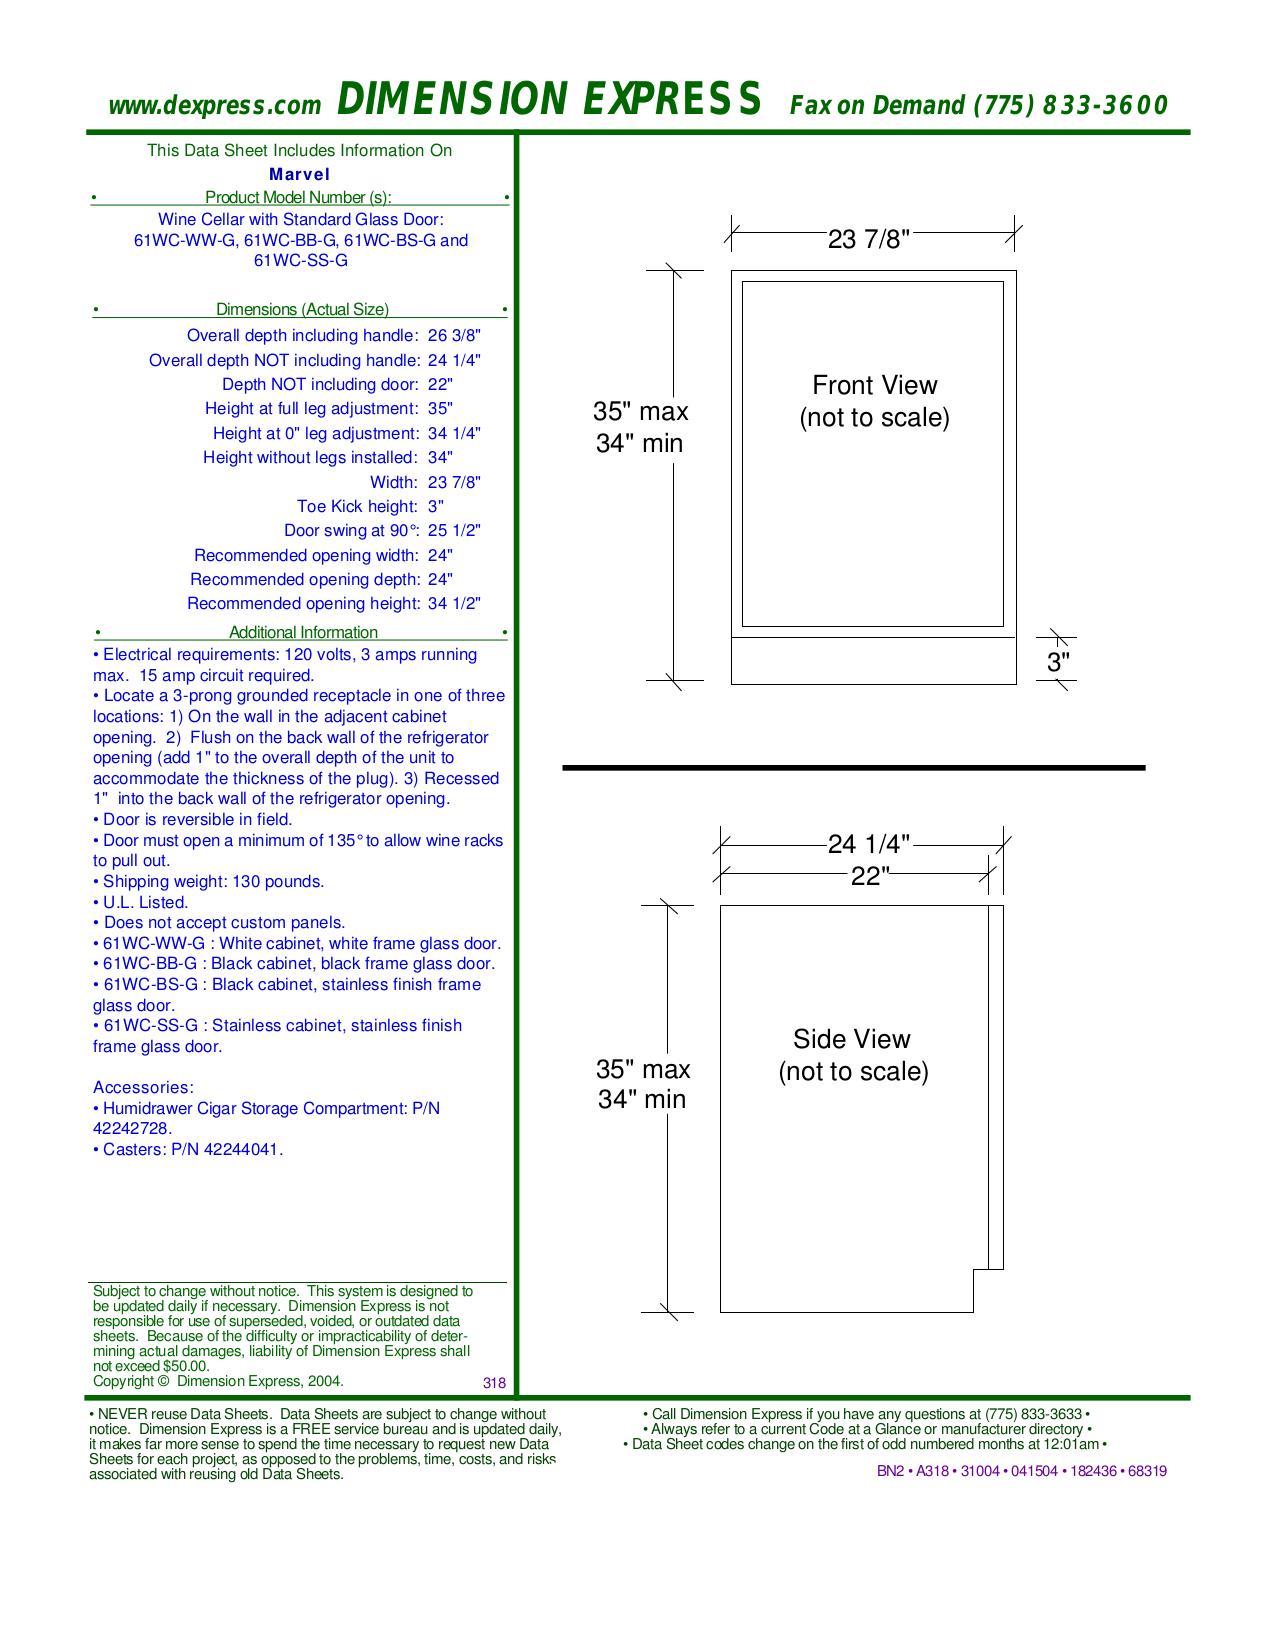 pdf for Marvel Refrigerator 61WC-SS-G manual